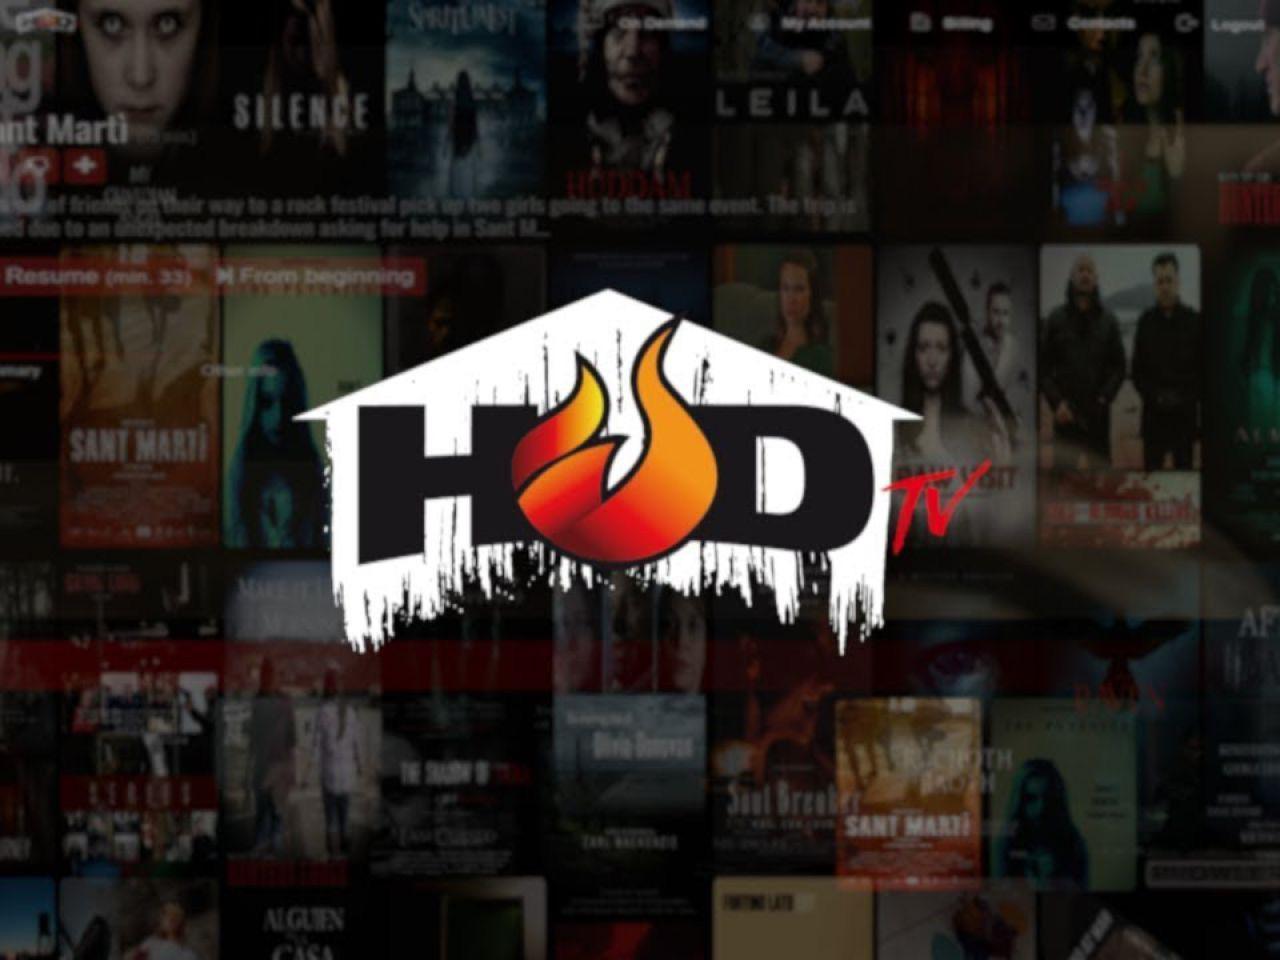 hodtv-arriva-italia-piattaforma-streaming-dedicata-all-horror-v3-455959-1280x960-1597189958.jpg